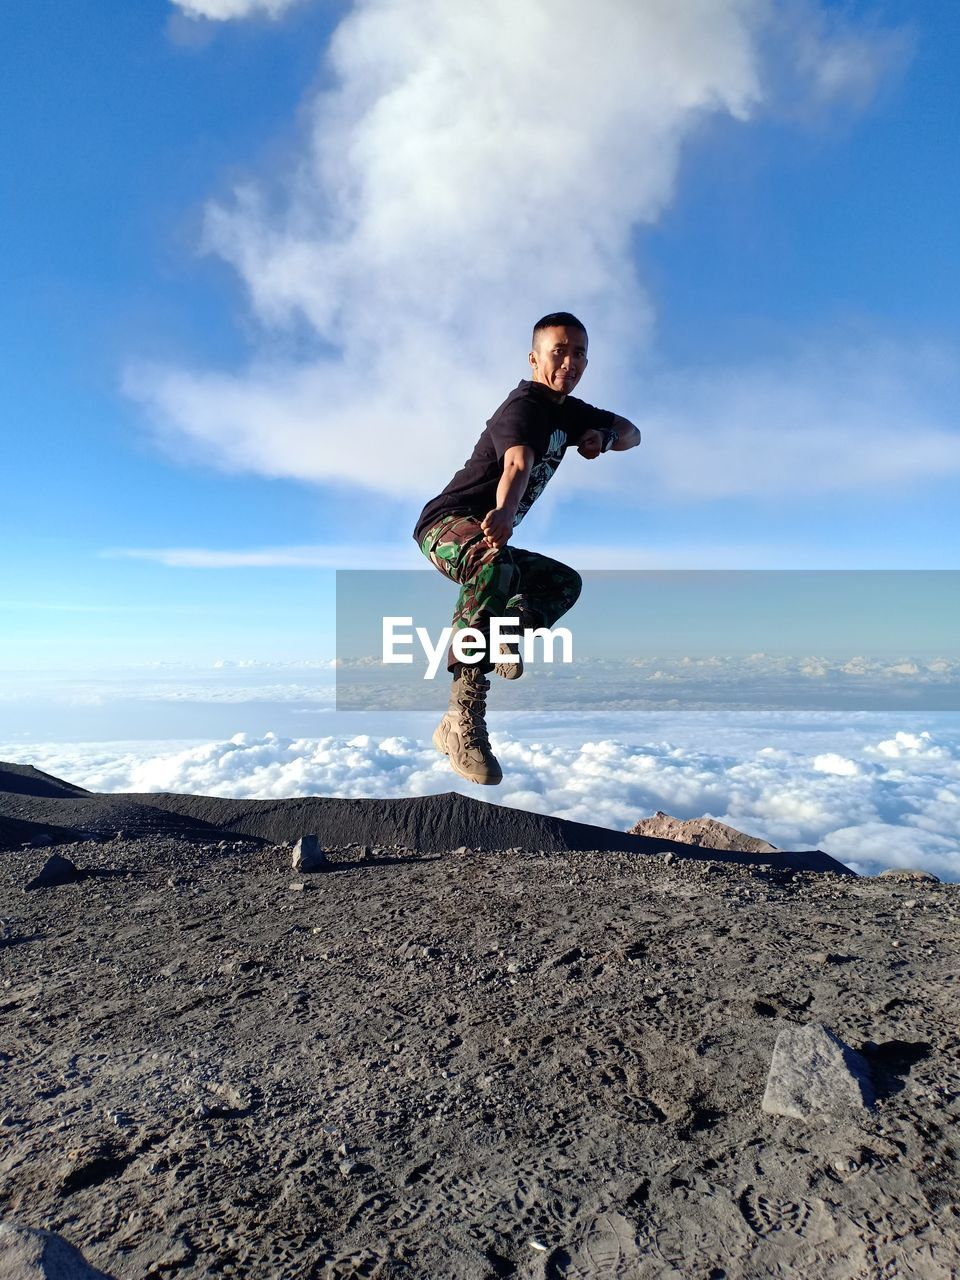 Performs silat kicks in the air